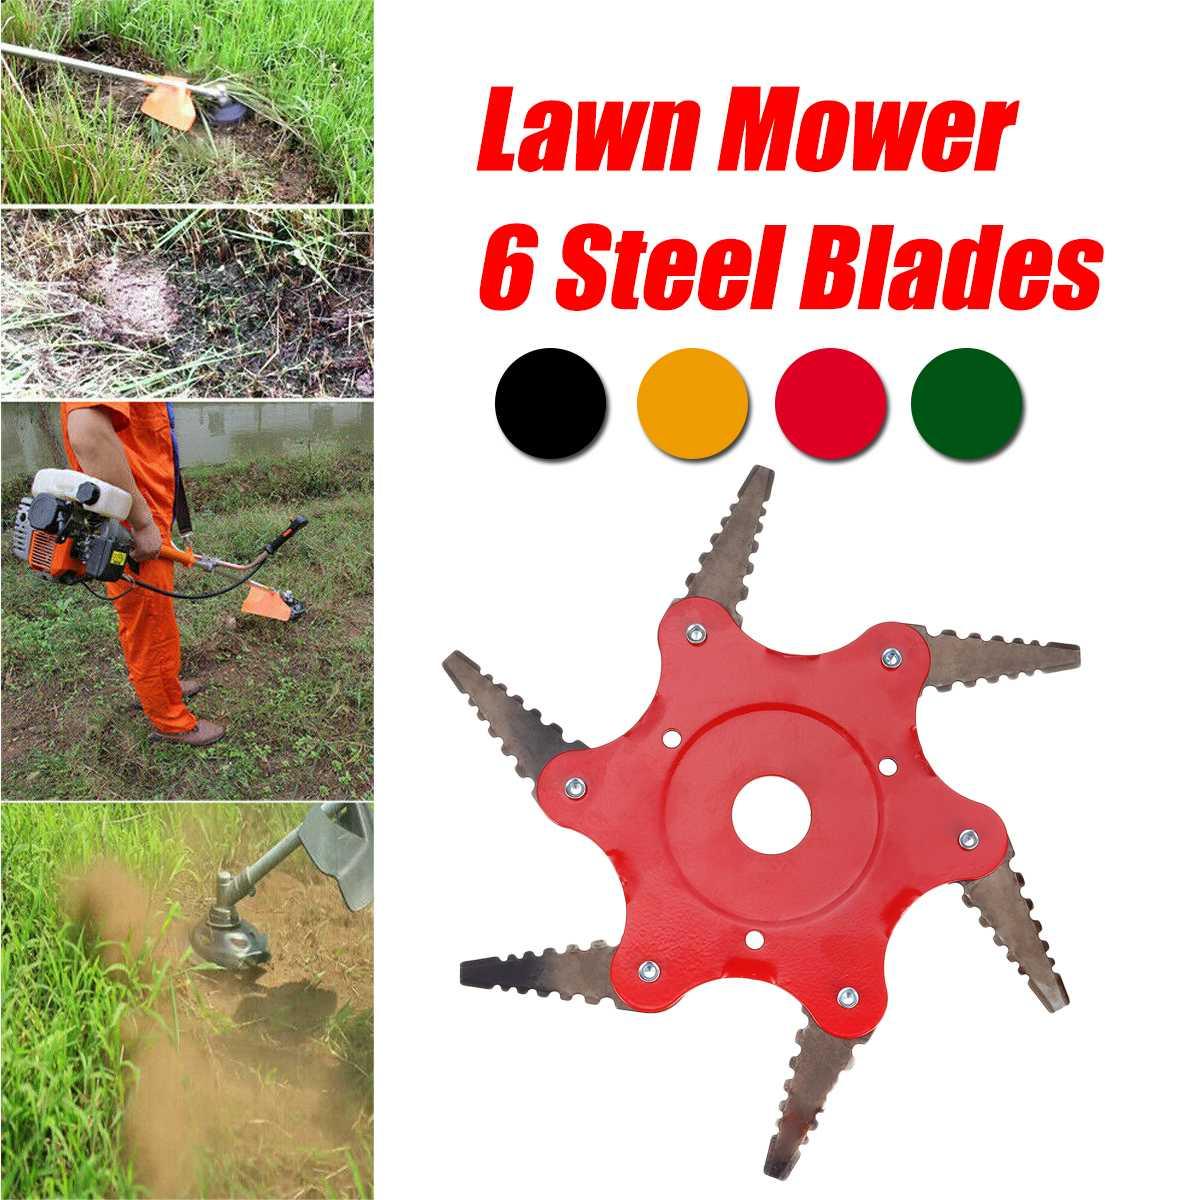 6 Teeth Grass Trimmer Head Brush Cutter Steel Garden Tool Strimmer Lawn Mower Blade